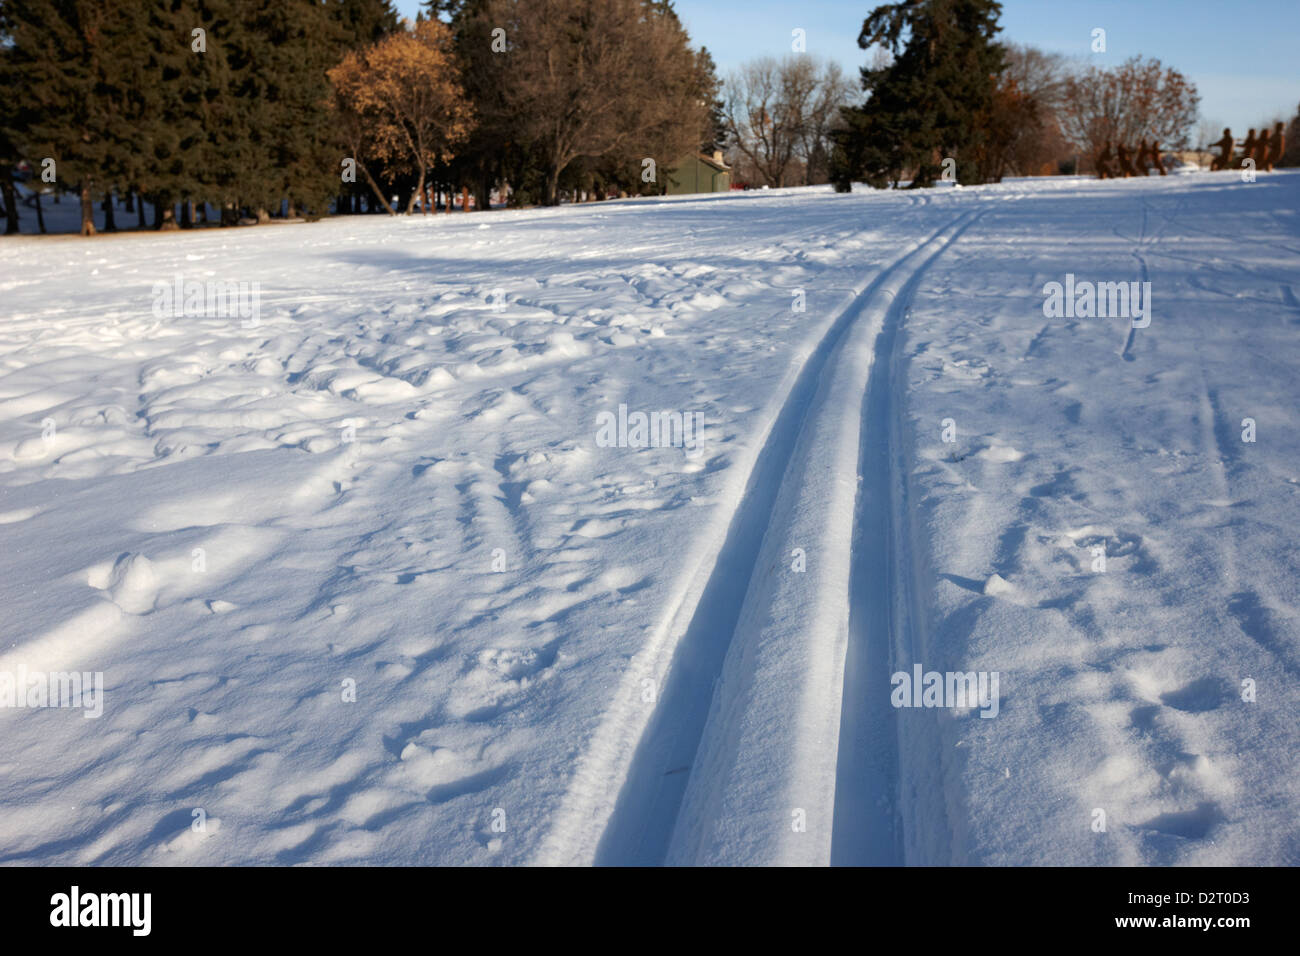 cross country skiing tracks in kinsmen park Saskatoon Saskatchewan Canada - Stock Image